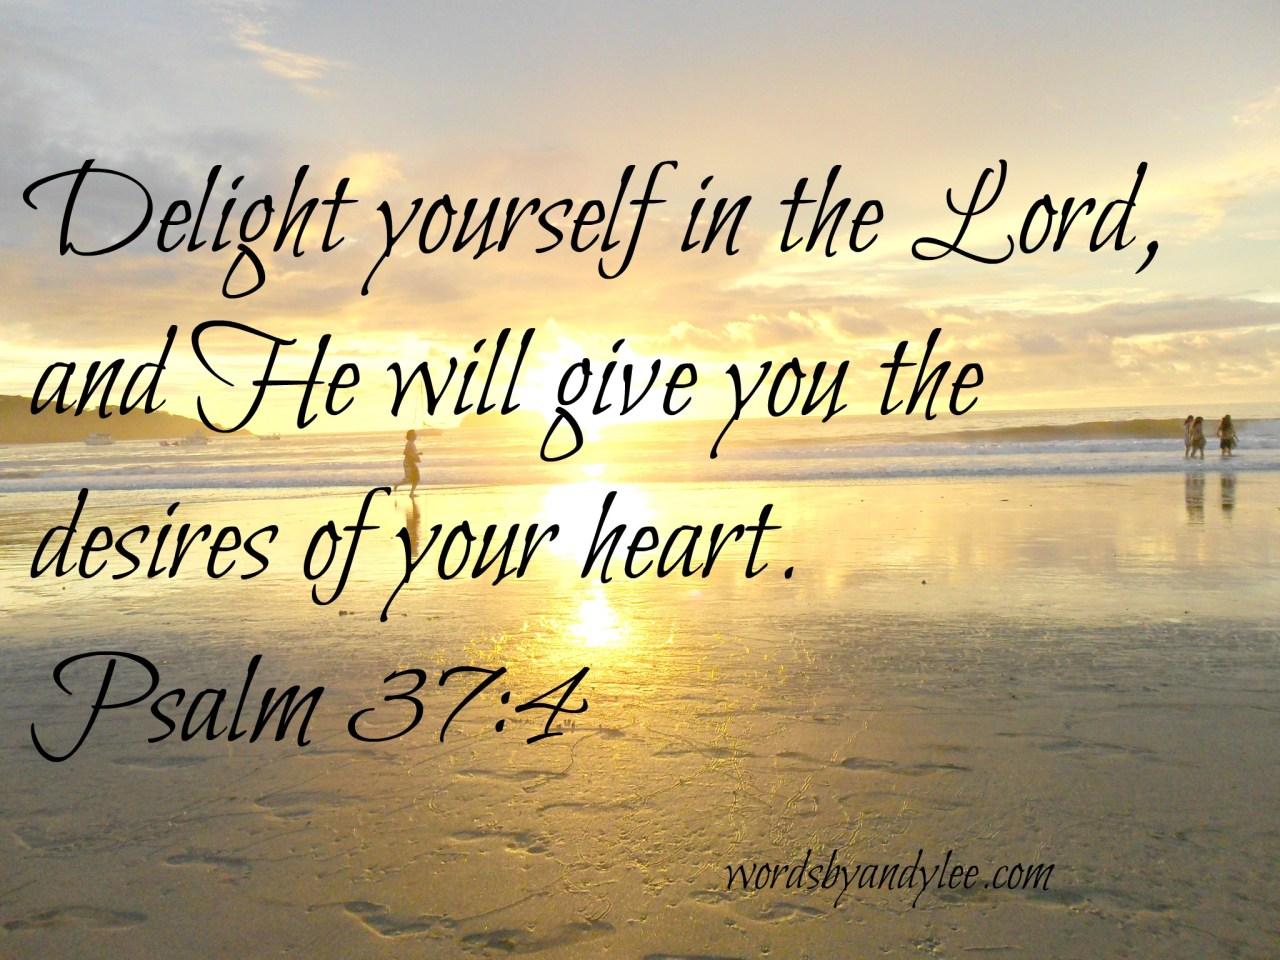 Costa Rica 032 Psalm 374